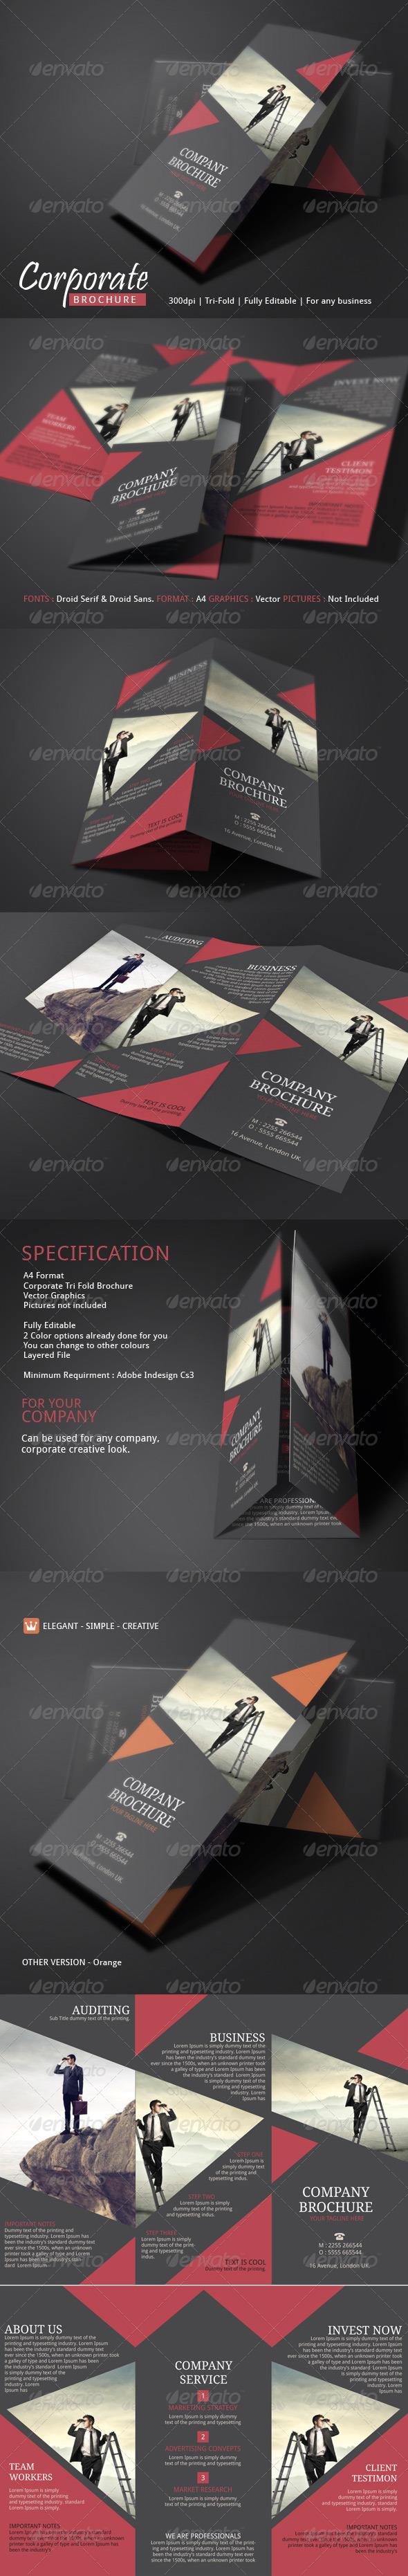 GraphicRiver Corporate Brochure Template 7450480